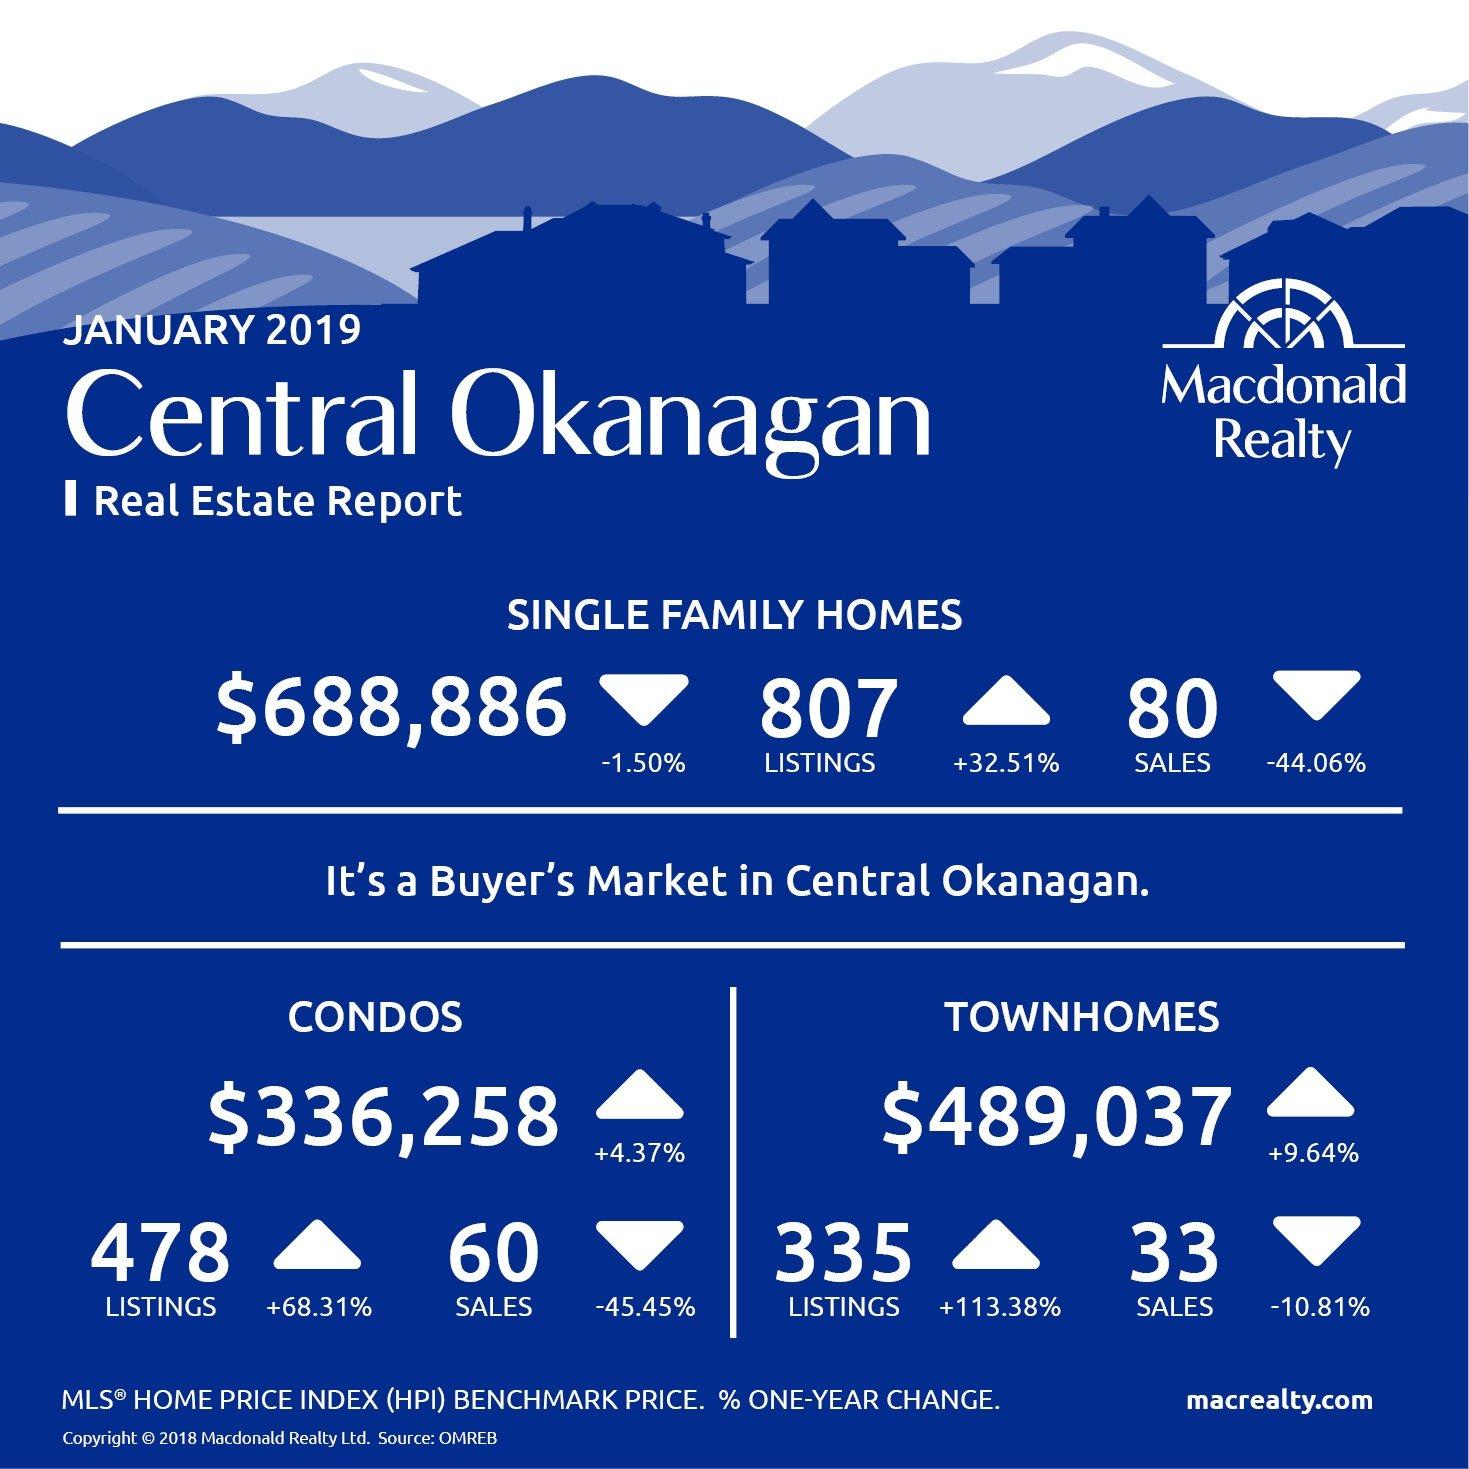 Okanagan Real Estate Market Statistics – January 2019